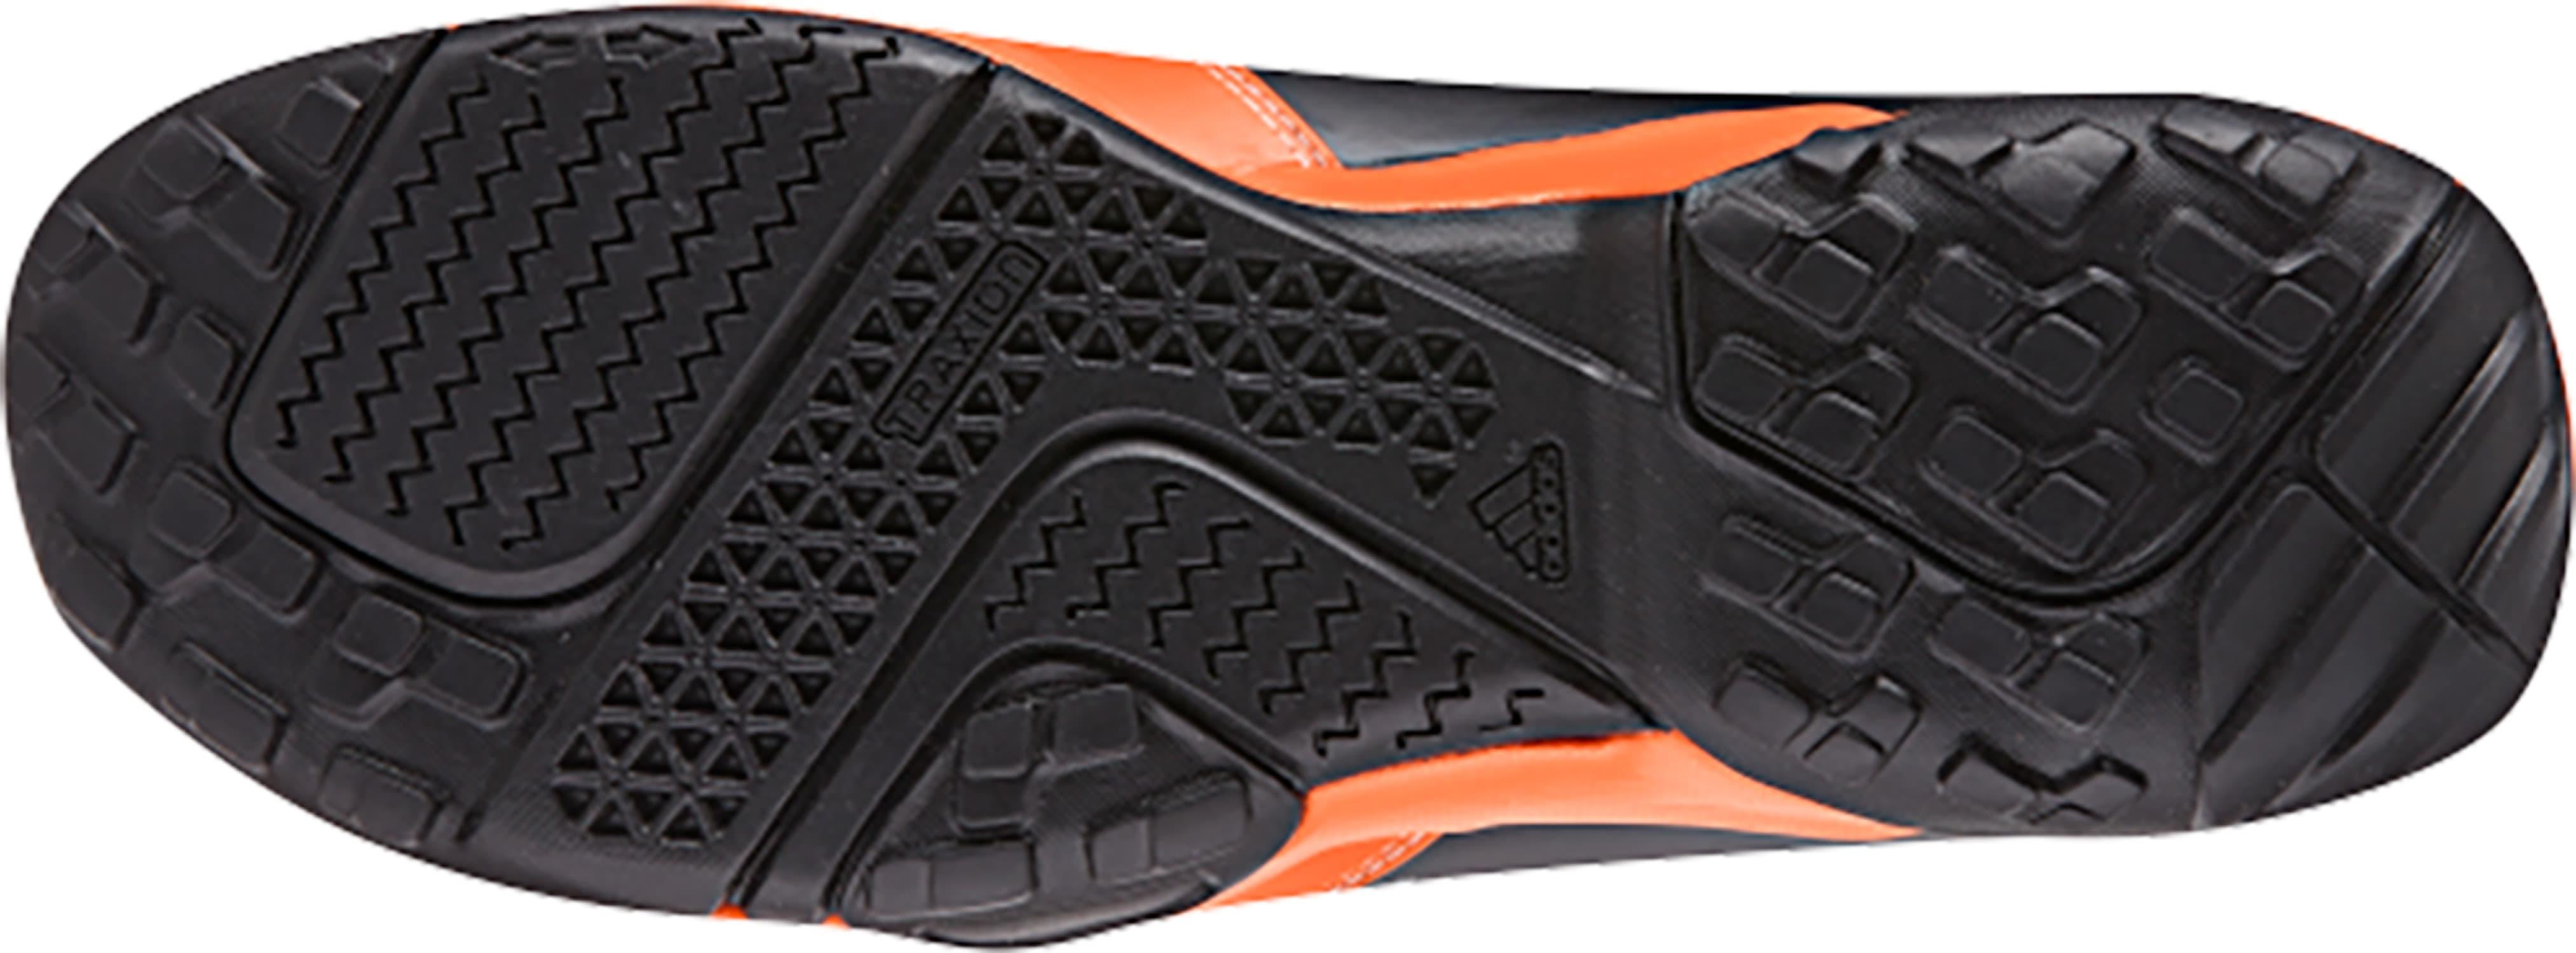 Adidas Terrex Hydro Pro Water Boots - thumbnail 2 da38de0f3e381